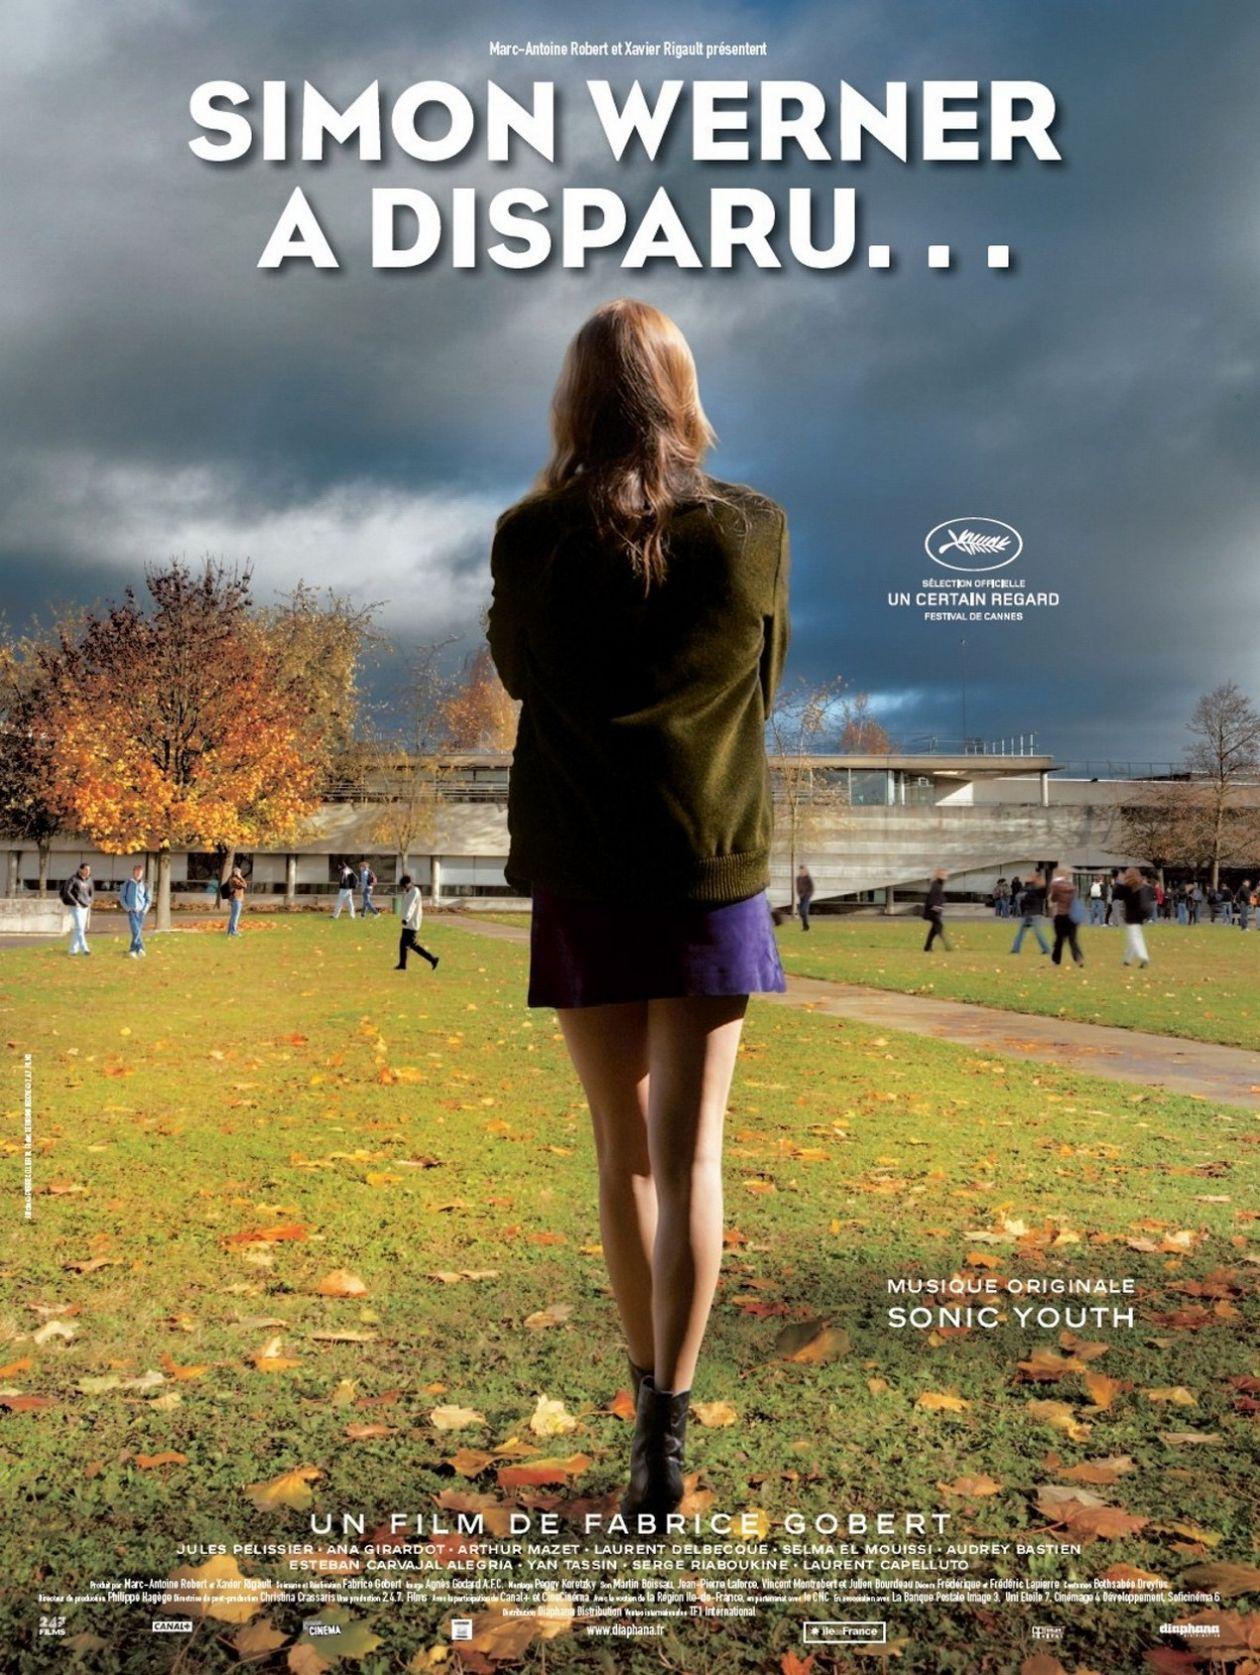 Ana Girardot : Simon Werner a disparu... | Fabrice Gobert / Affiche du film / Movie Poster